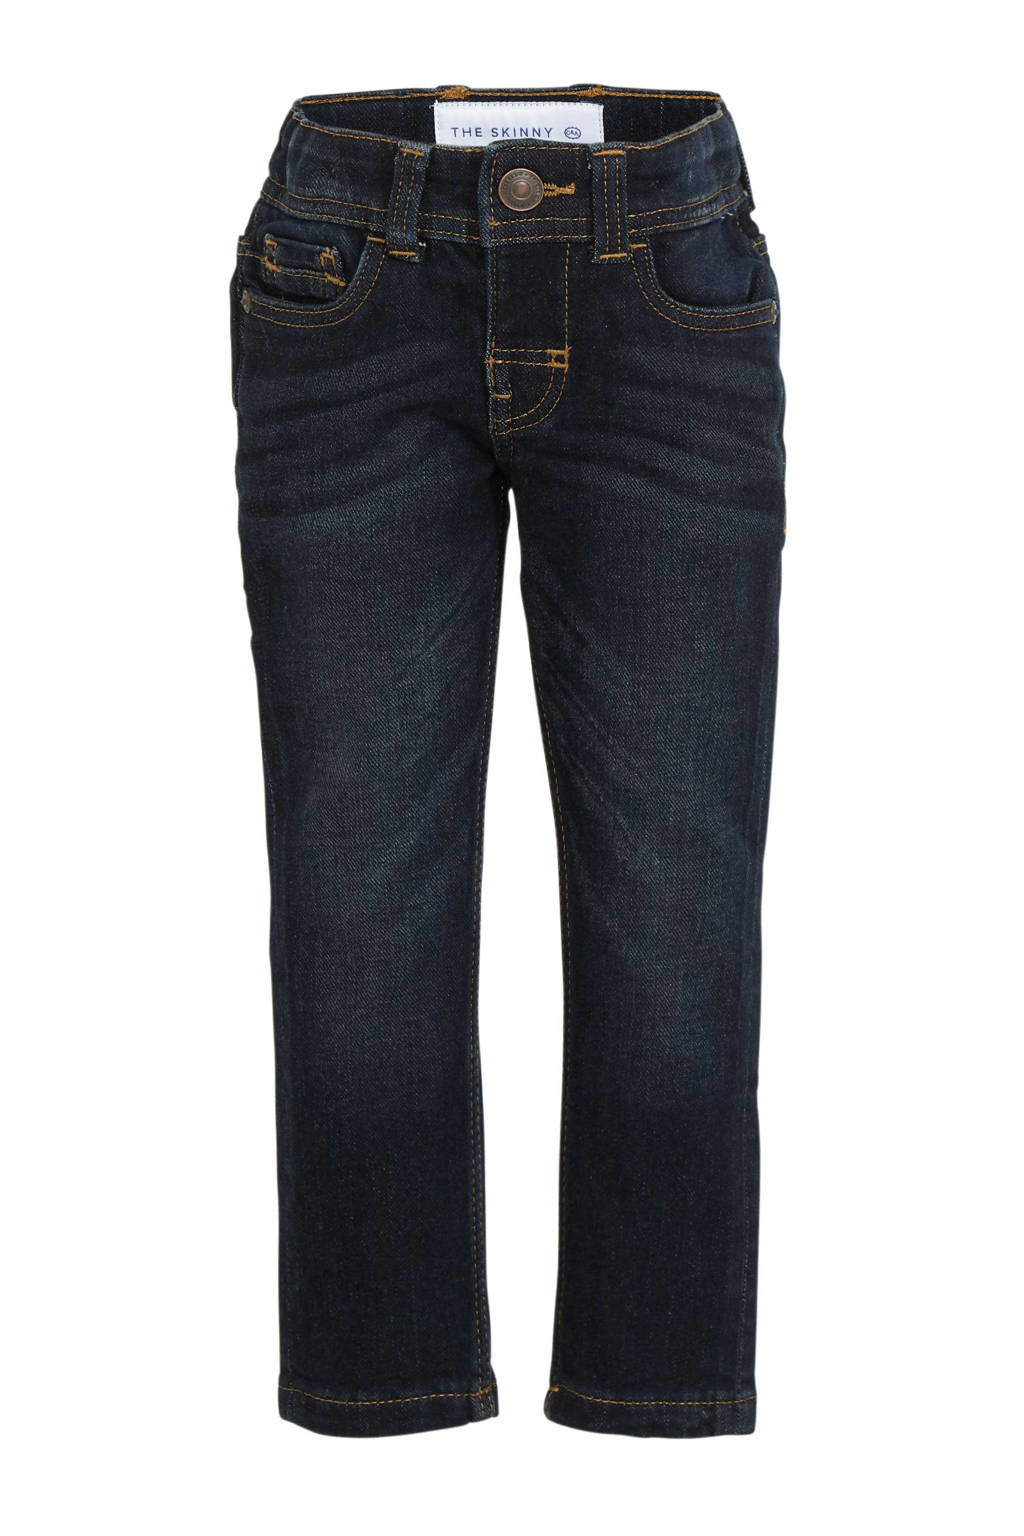 C&A Palomino skinny jeans dark denim, Dark denim